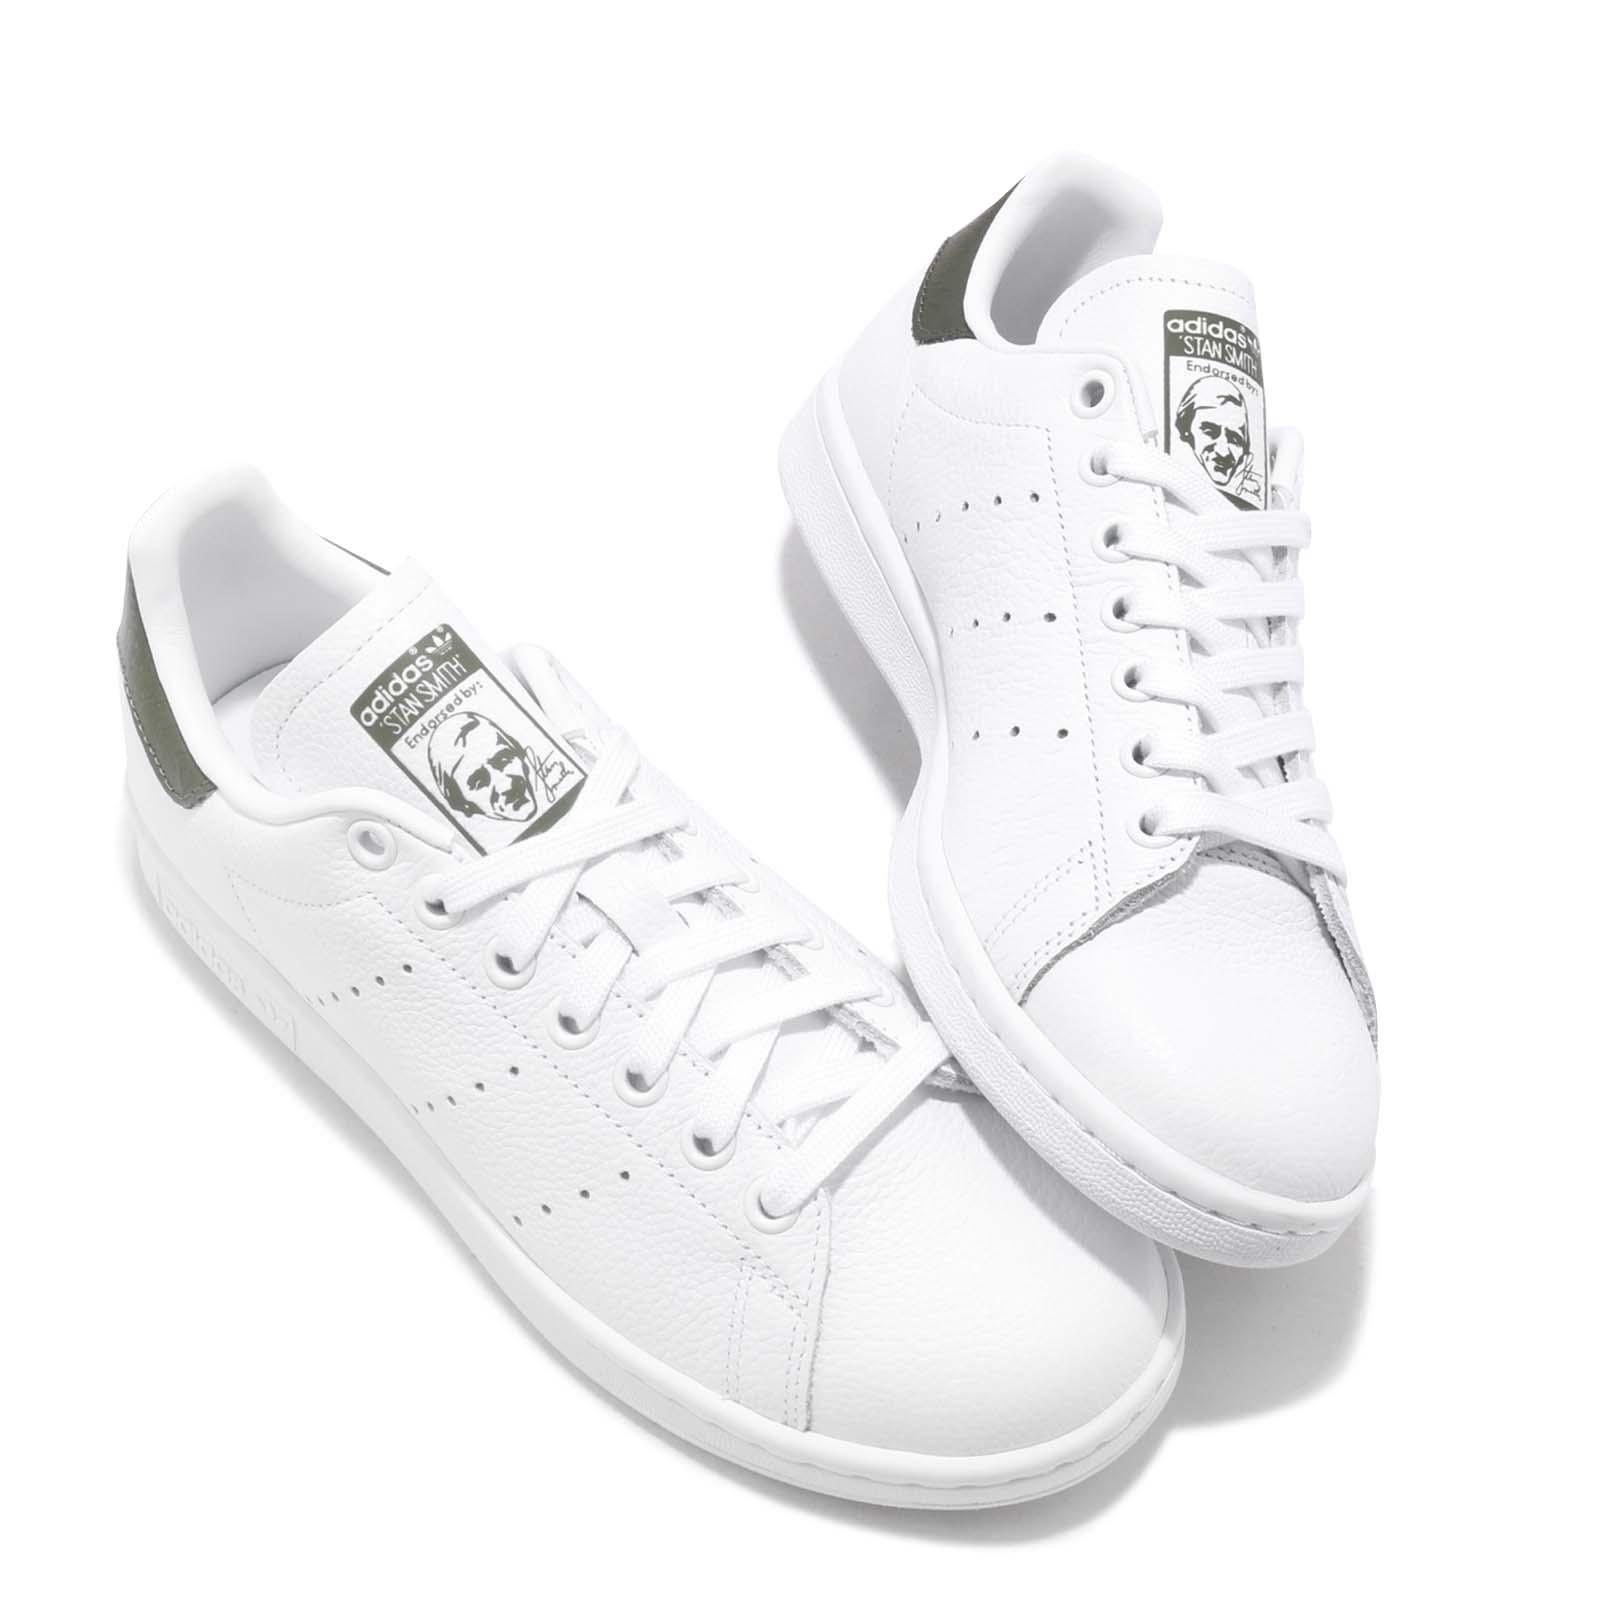 b41477 adidas Shop Clothing \u0026 Shoes Online